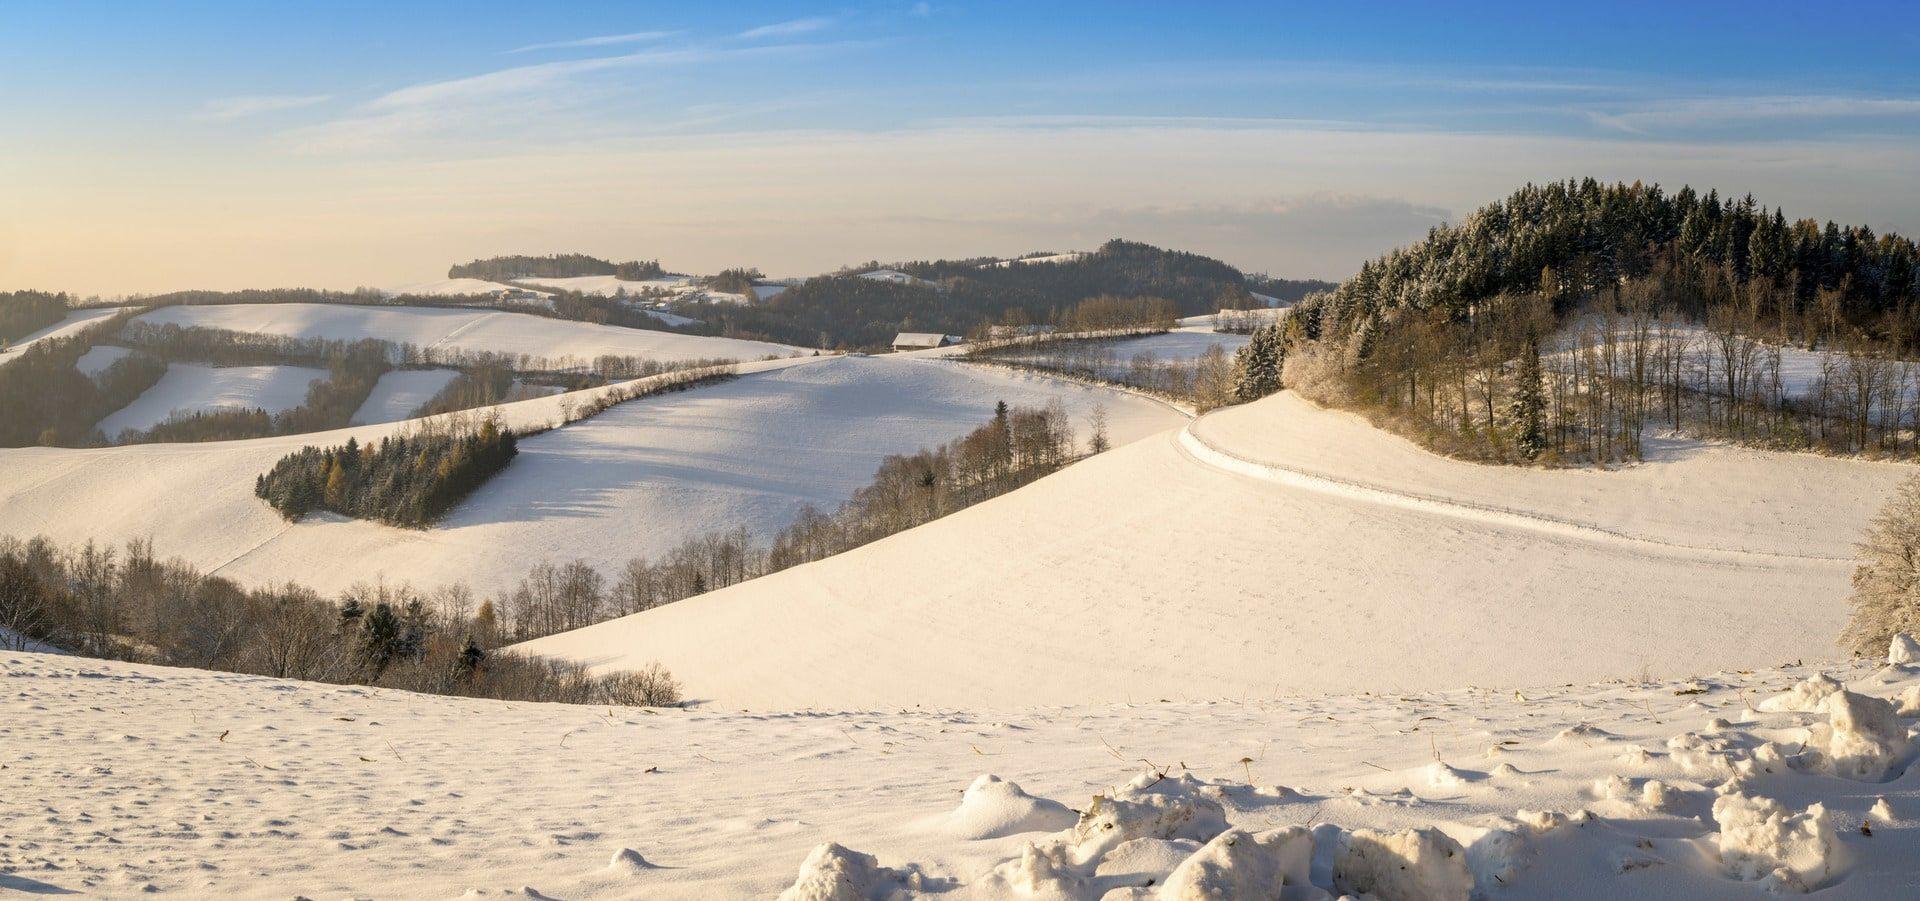 Wiener Alpen Bucklige Welt